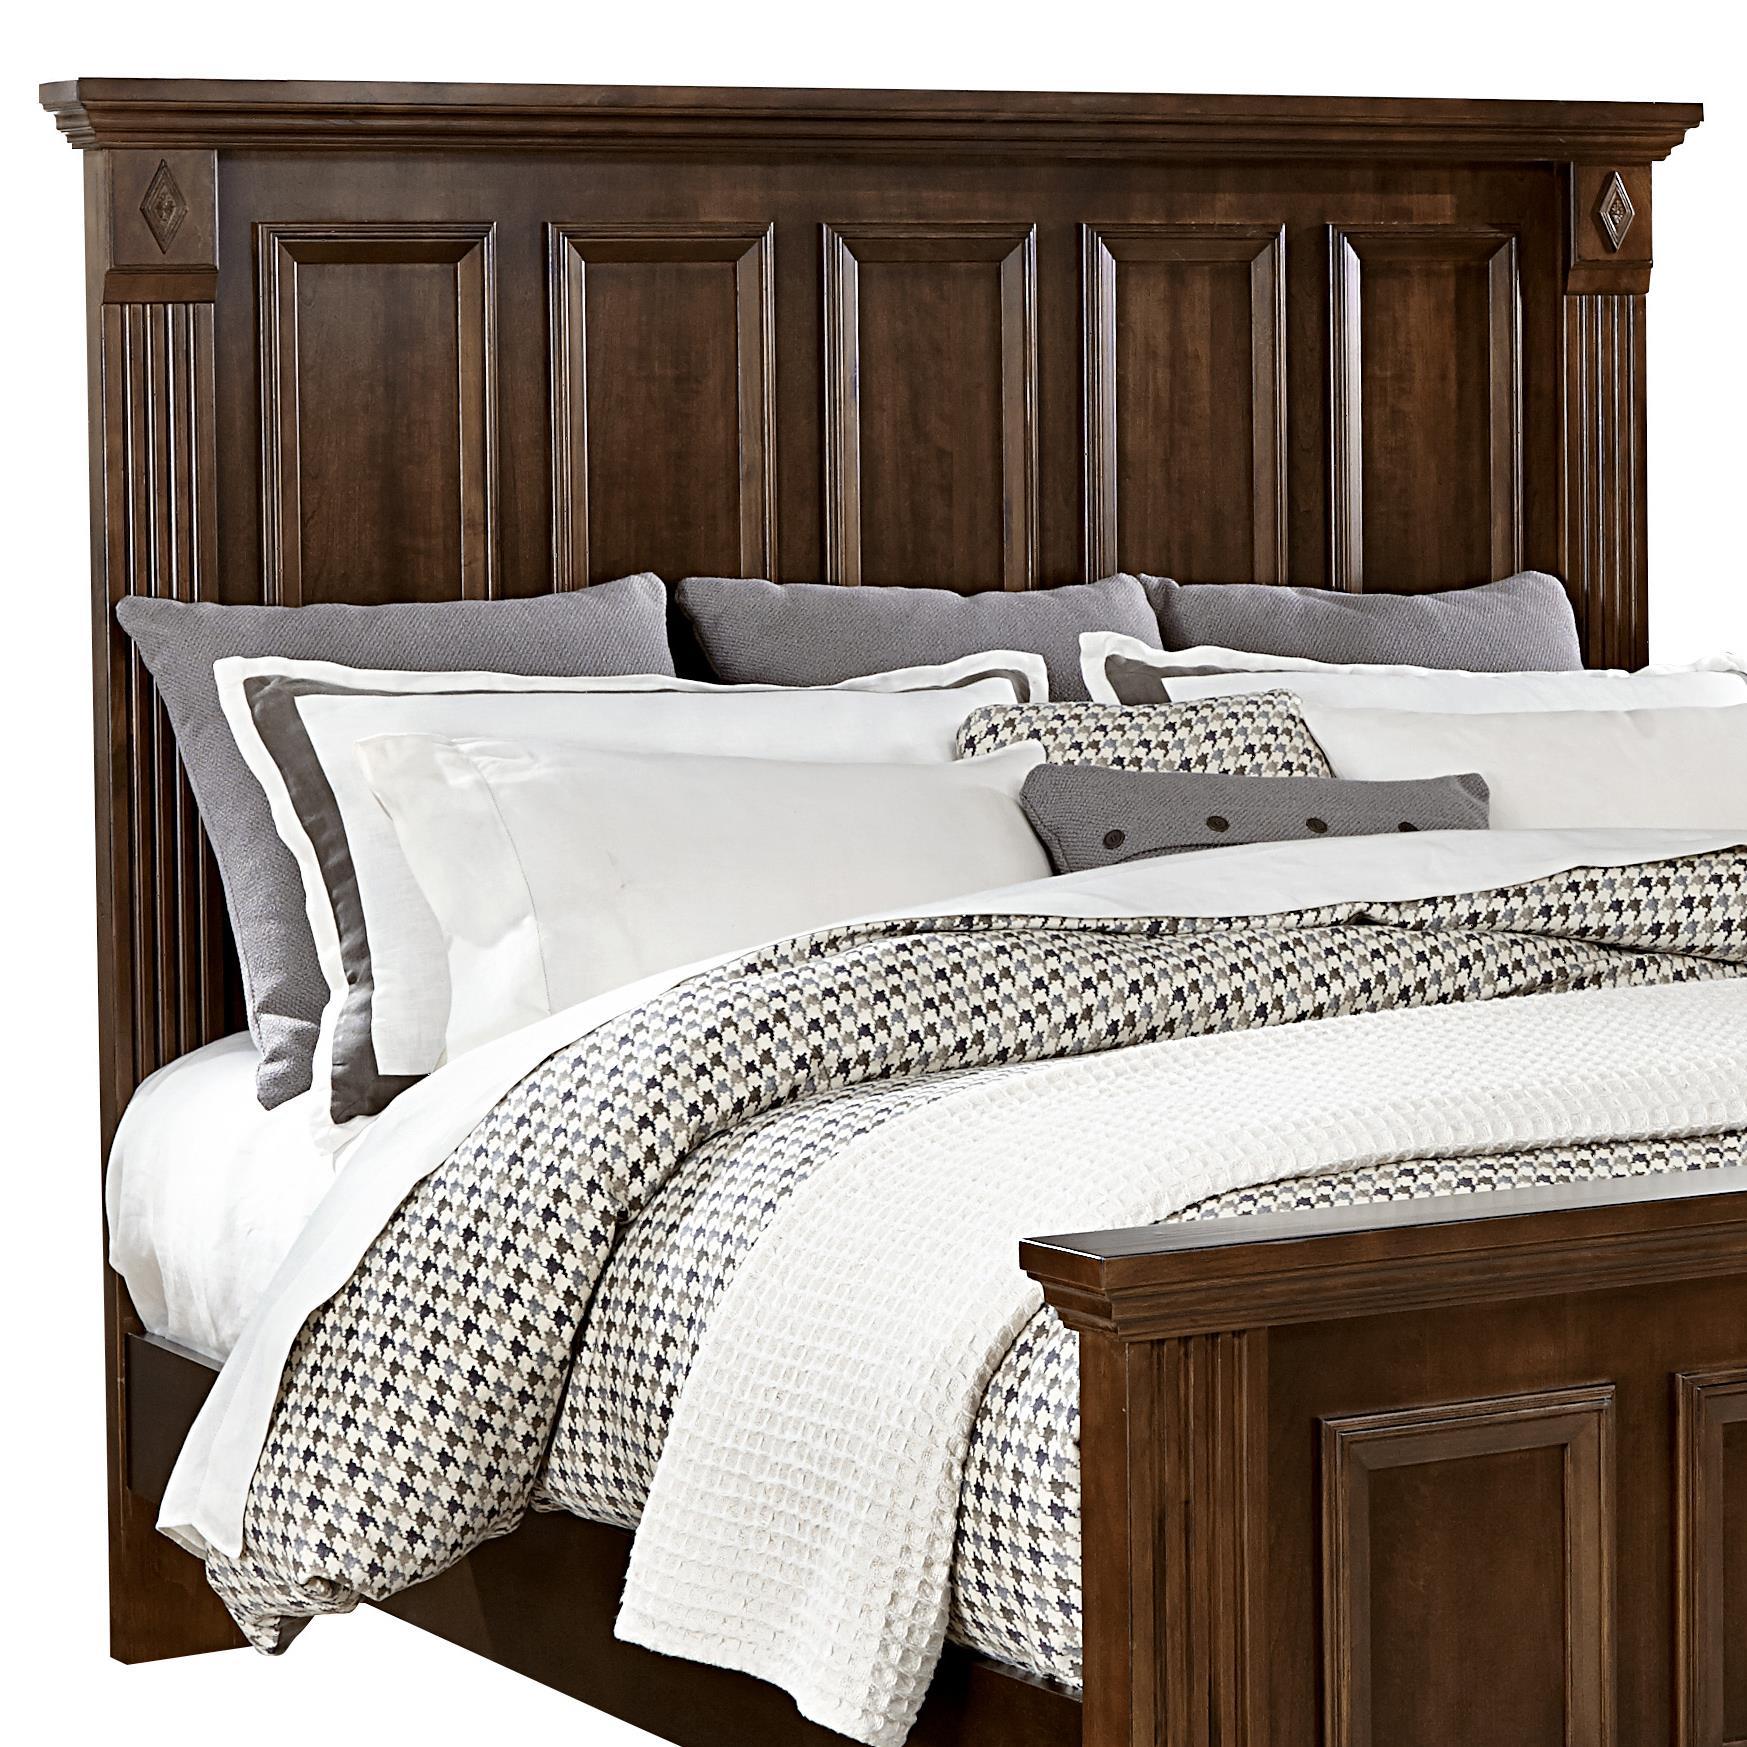 Bassett Furniture San Antonio Tx: Vaughan Bassett Woodlands King Mansion Headboard